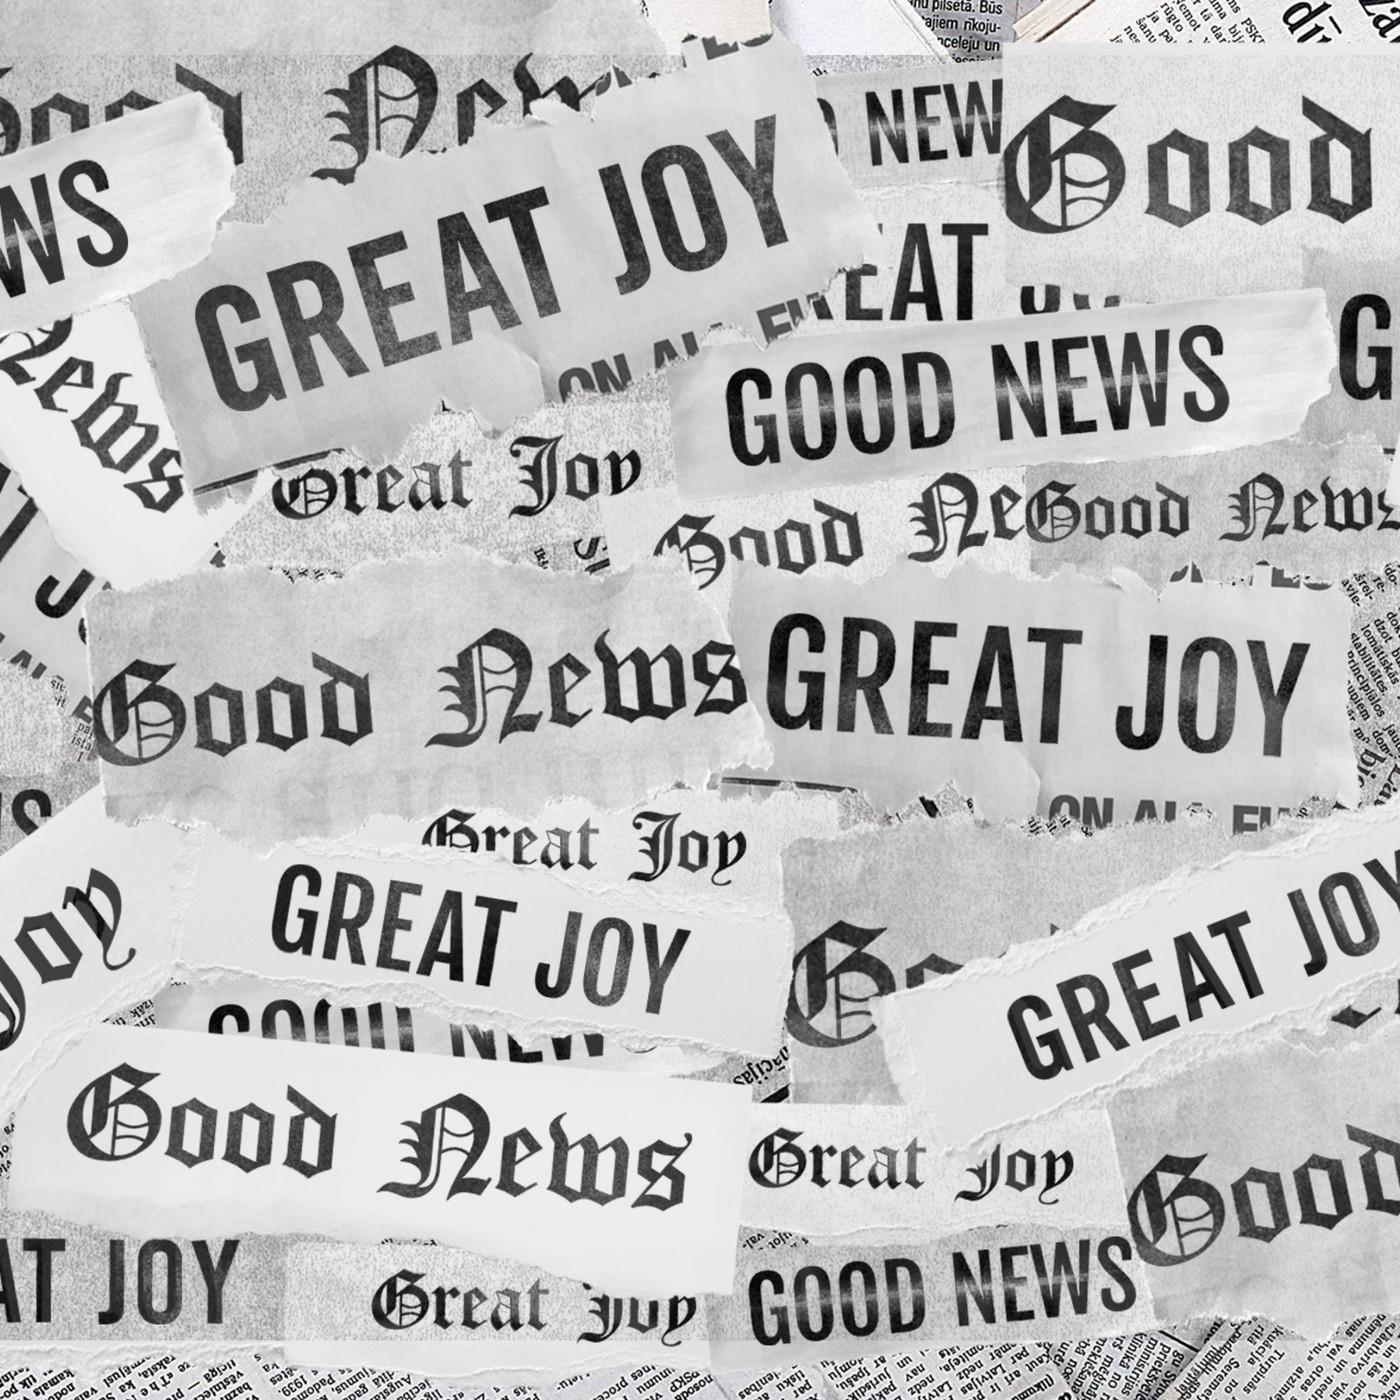 Sozo Church San Francisco: Good News Great Joy - Evangelism